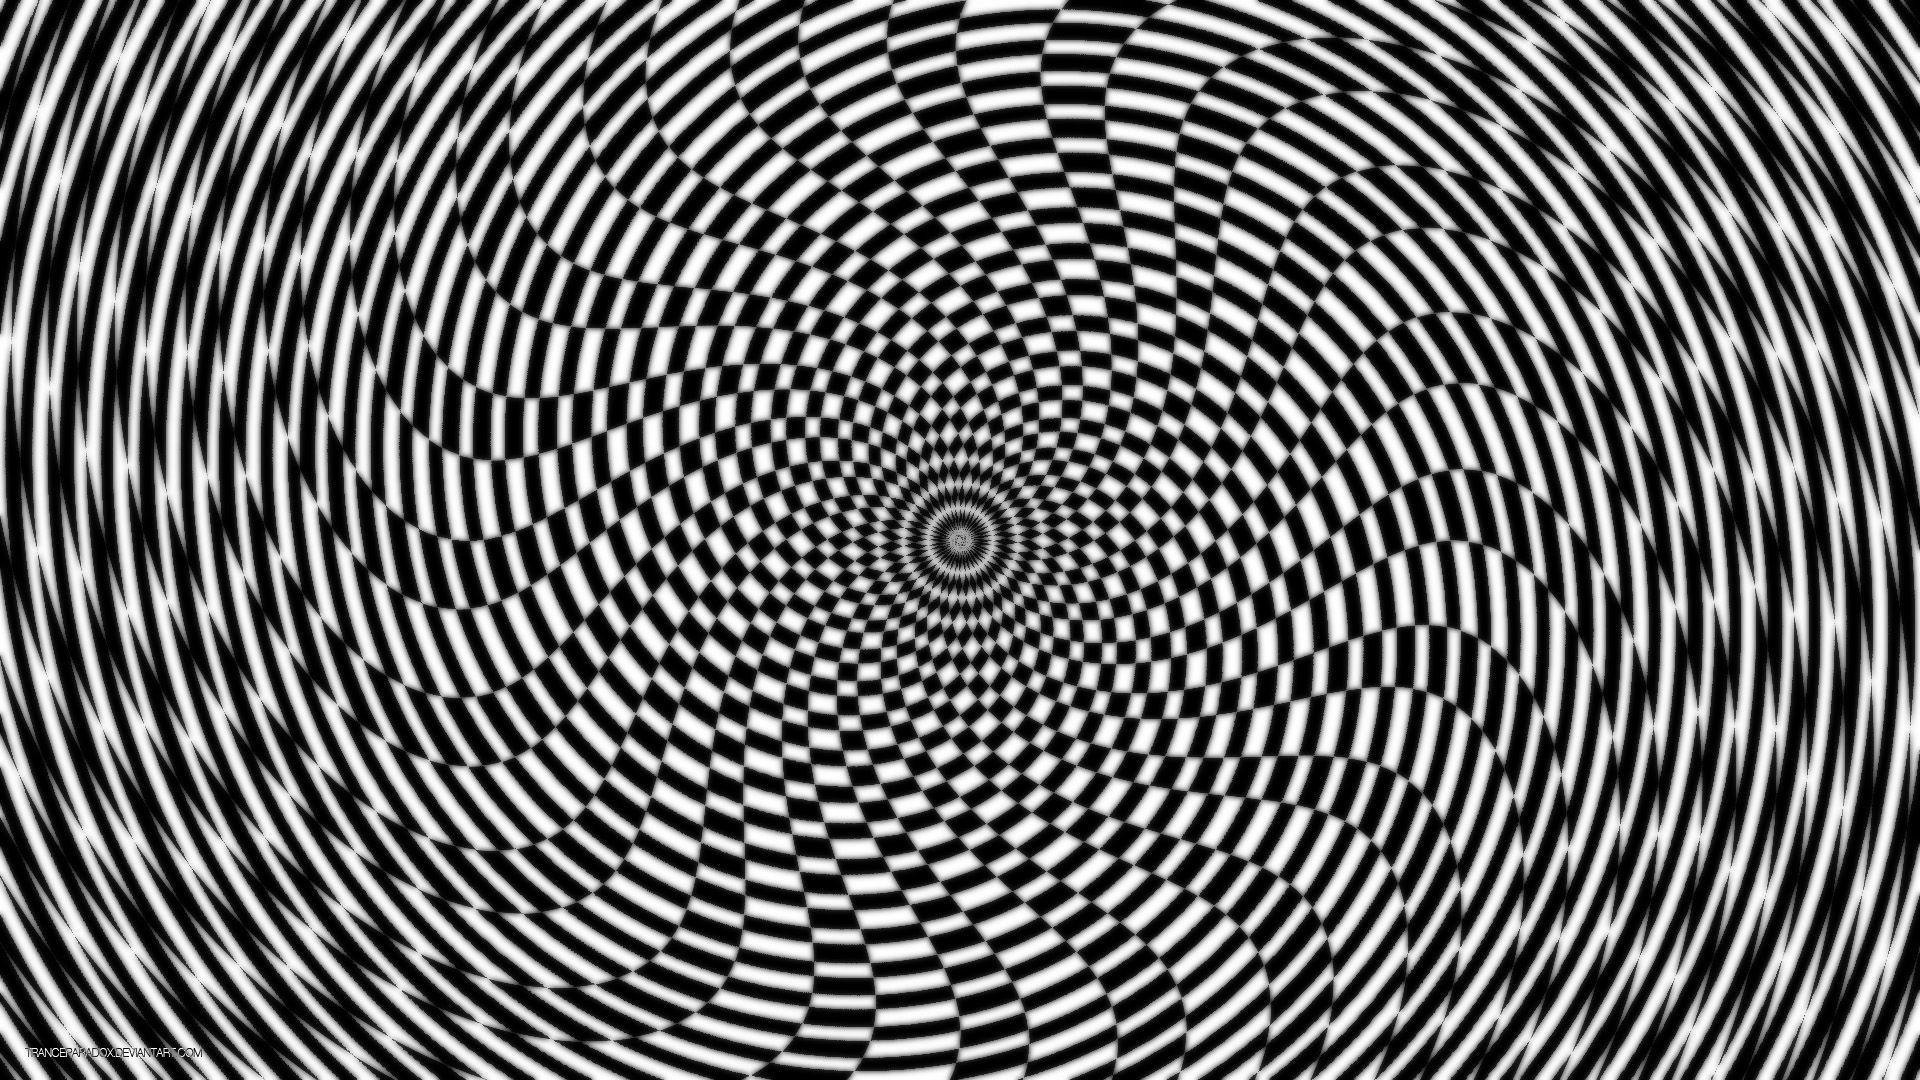 Trippy Psychedelic HD Wallpaper